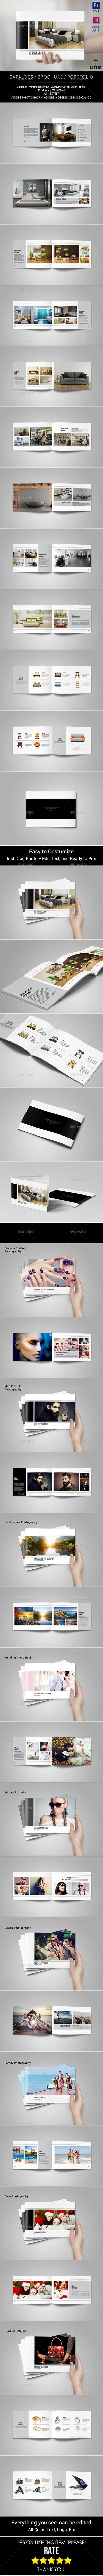 Portfolio Brochure Template #design Download: http://graphicriver.net/item/portfolio-brochure-template/12650518?ref=ksioks